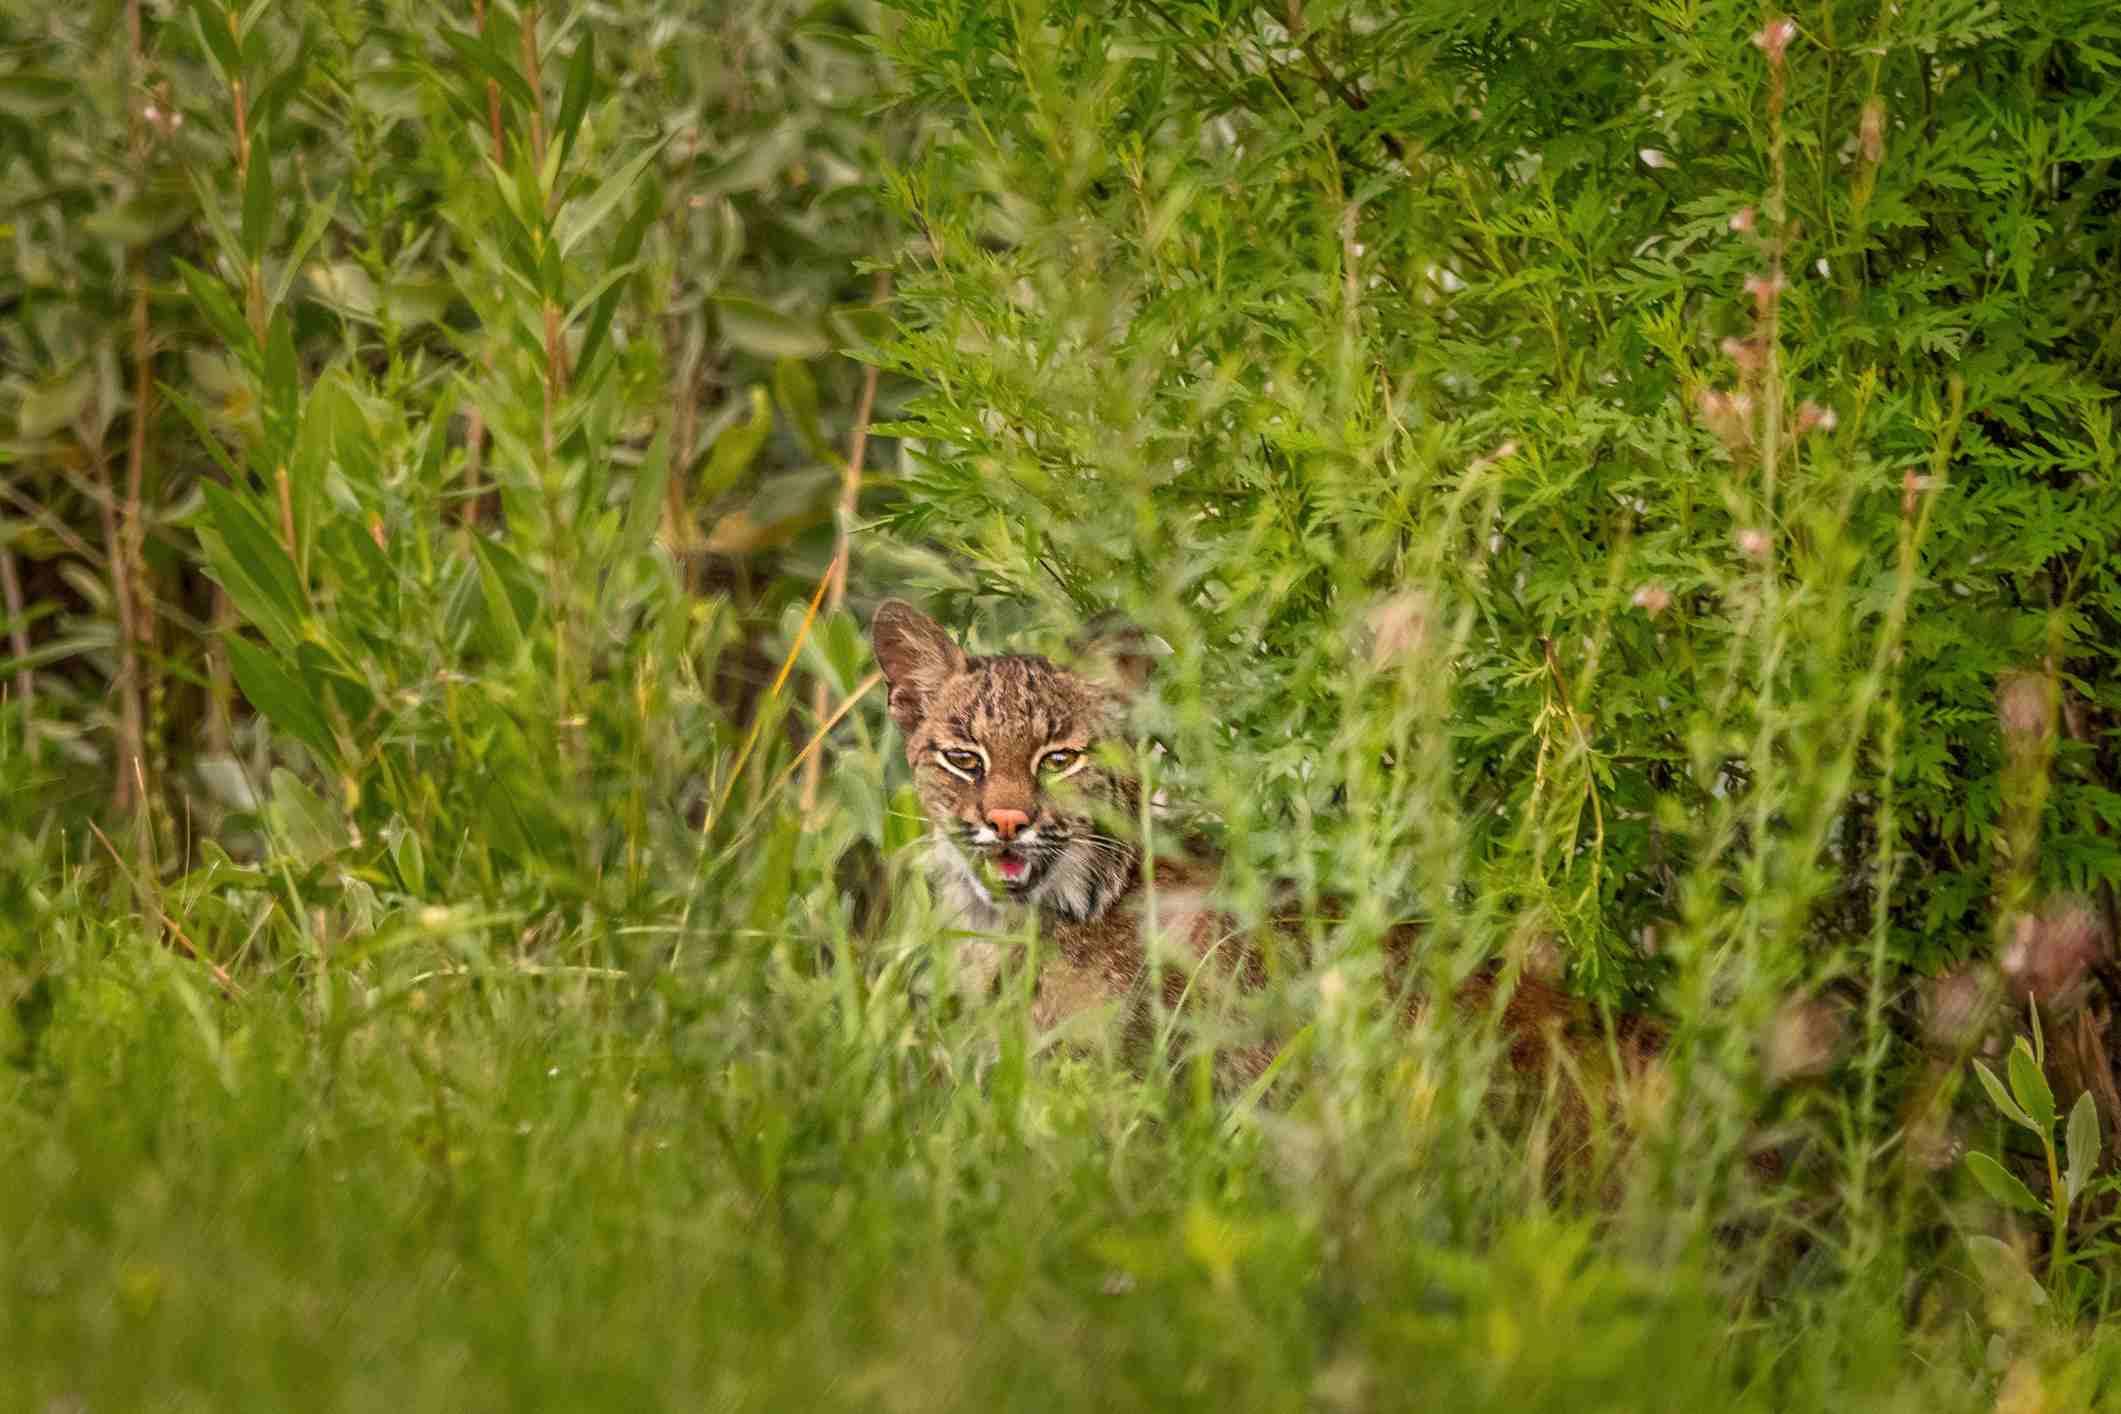 Perhaps the Primehook creature was an unfamiliar or unusual species of wild cat.